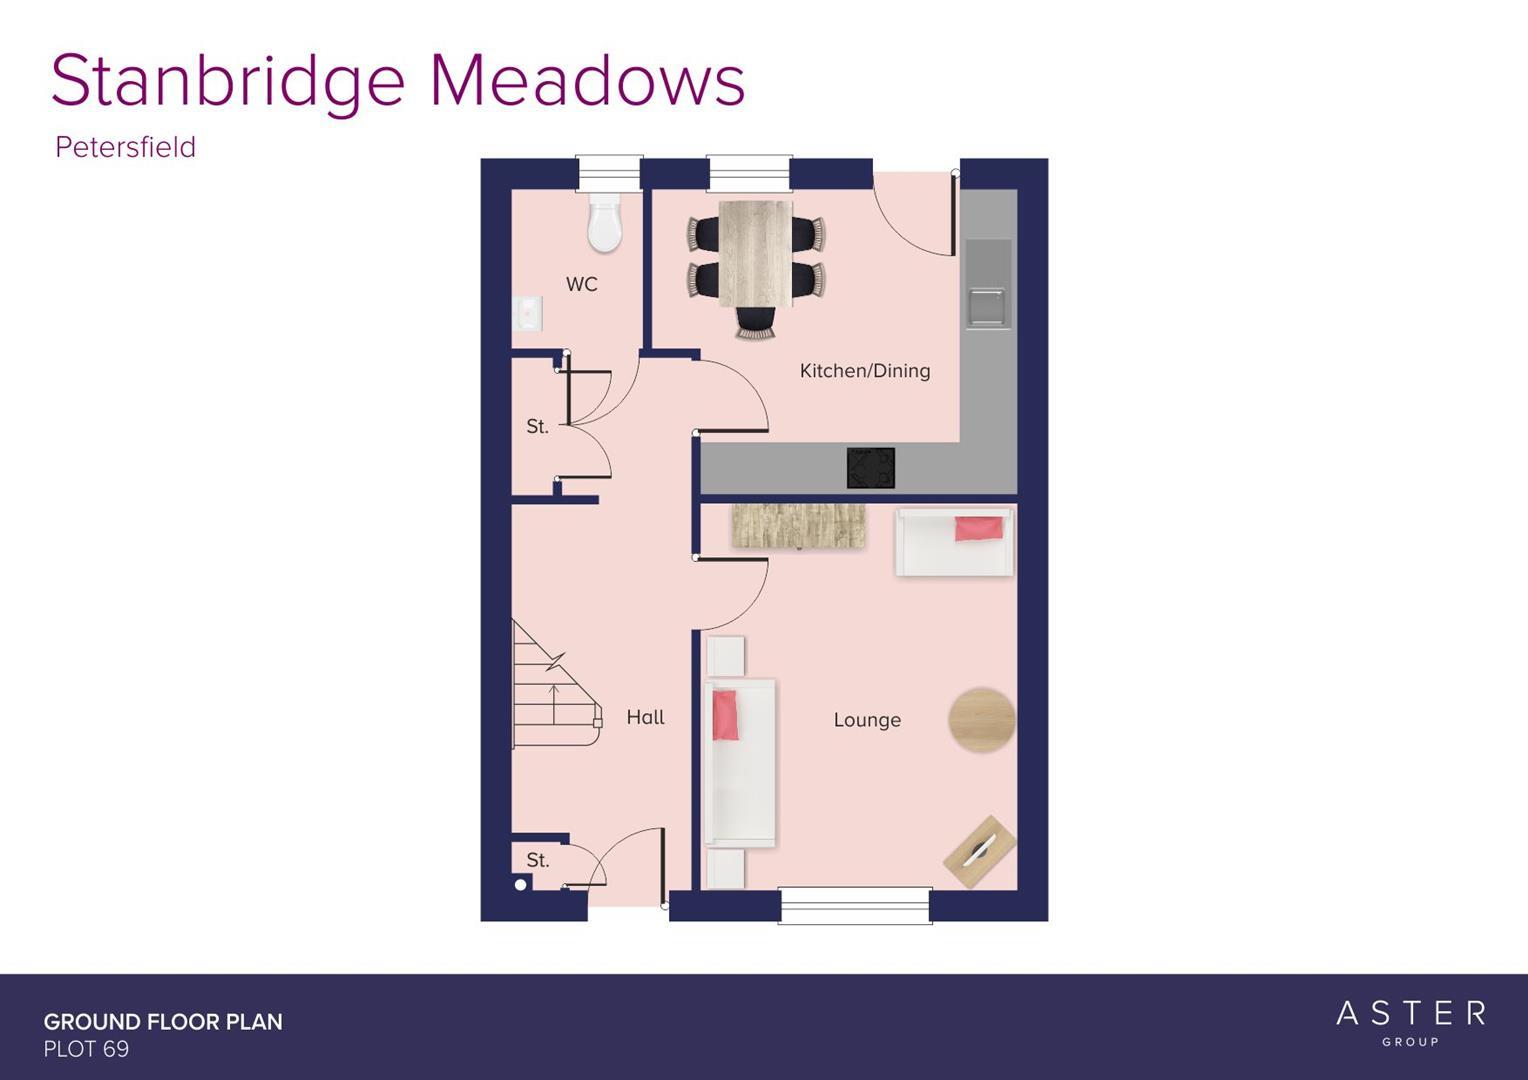 Stanbridge Meadows, Petersfield_Plot 69_GF_F.jpg